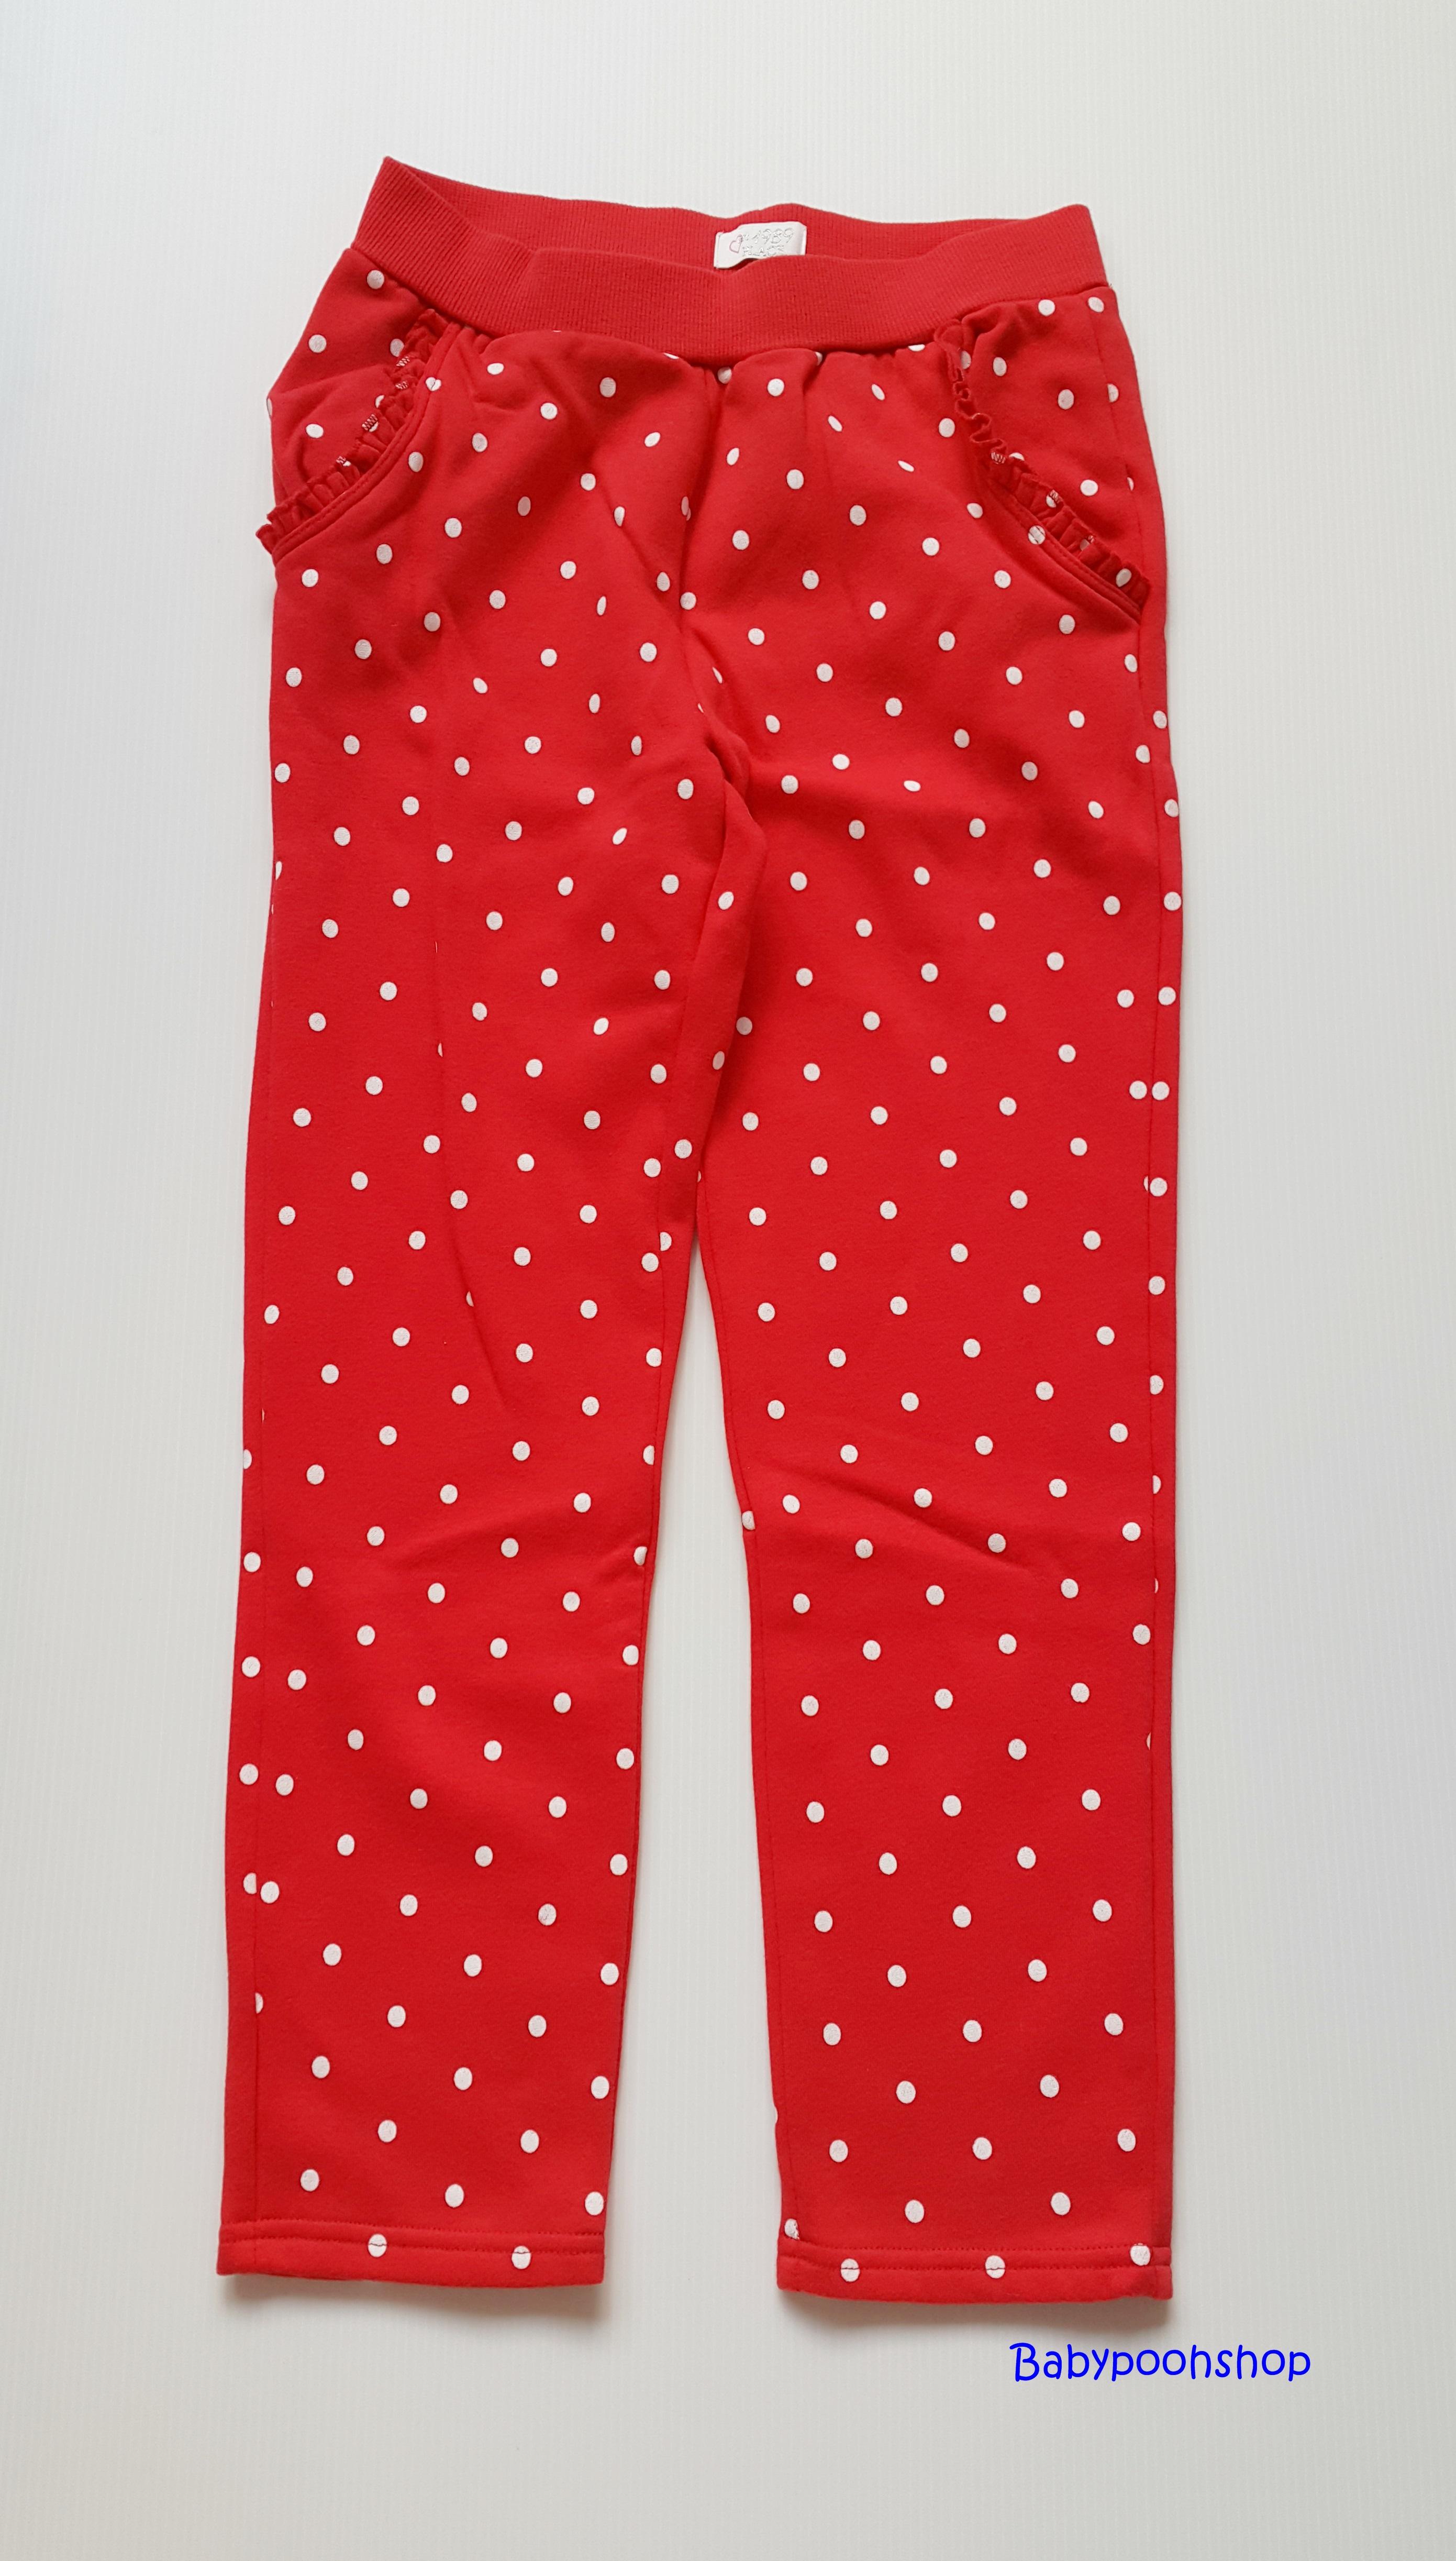 Place : กางเกงขายาวผ้ายืด สีแดงลายจุด size : 10-12y